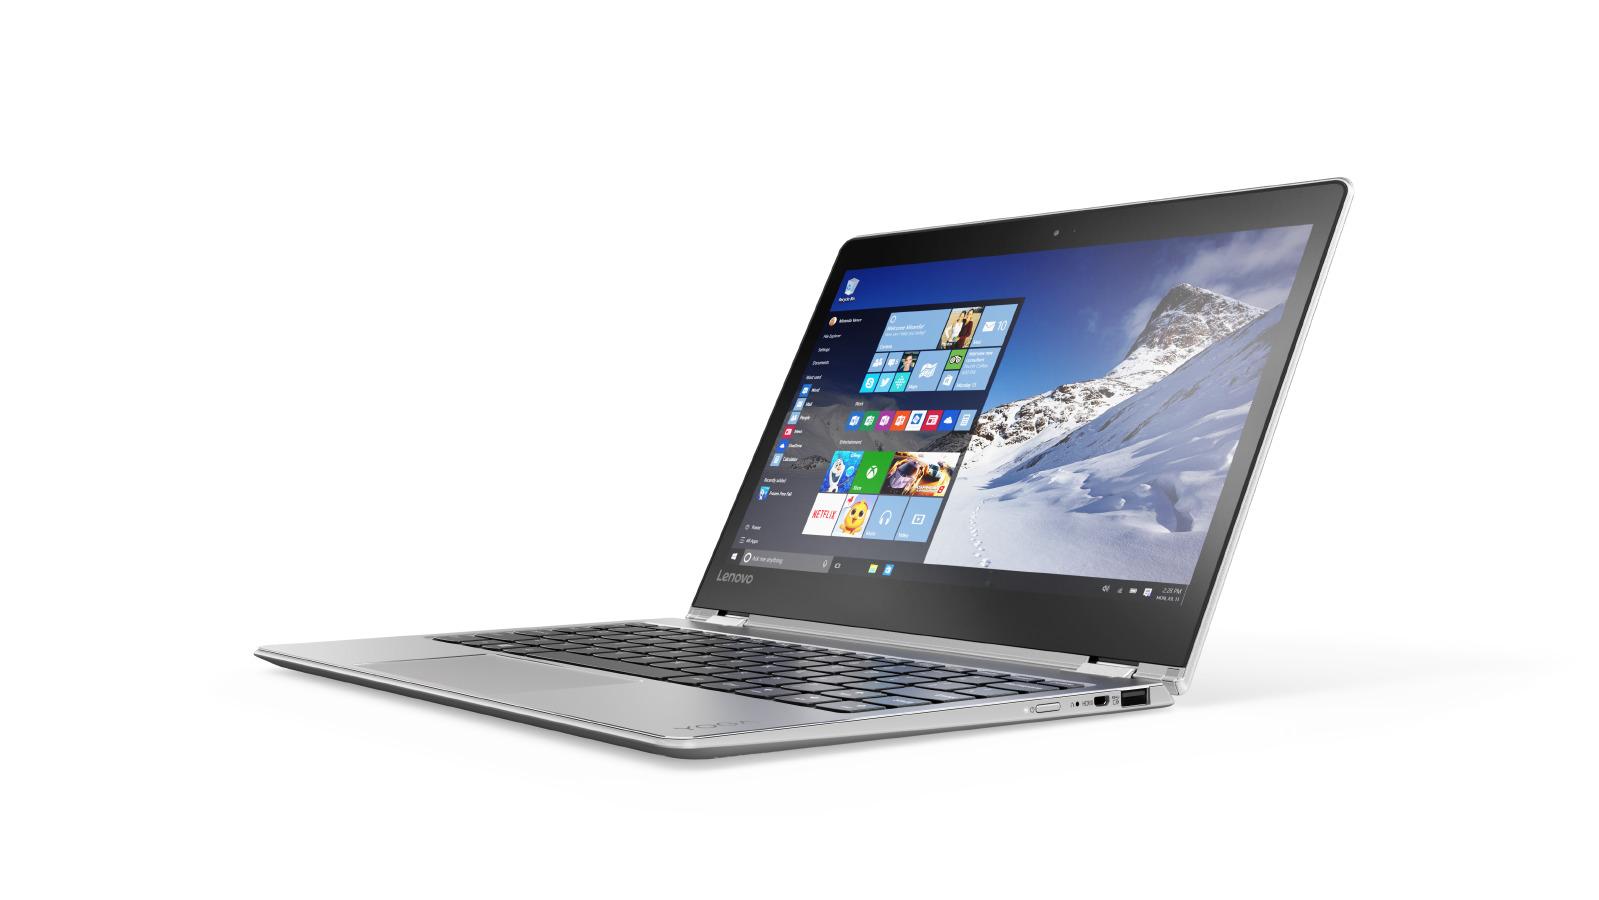 "Lenovo YOGA 710-11IKB Core M3-7Y30 2,60GHz/4GB/SSD 128GB/11,6"" FHD/IPS/multitouch/WIN10 stříbrná 80V6001UCK"